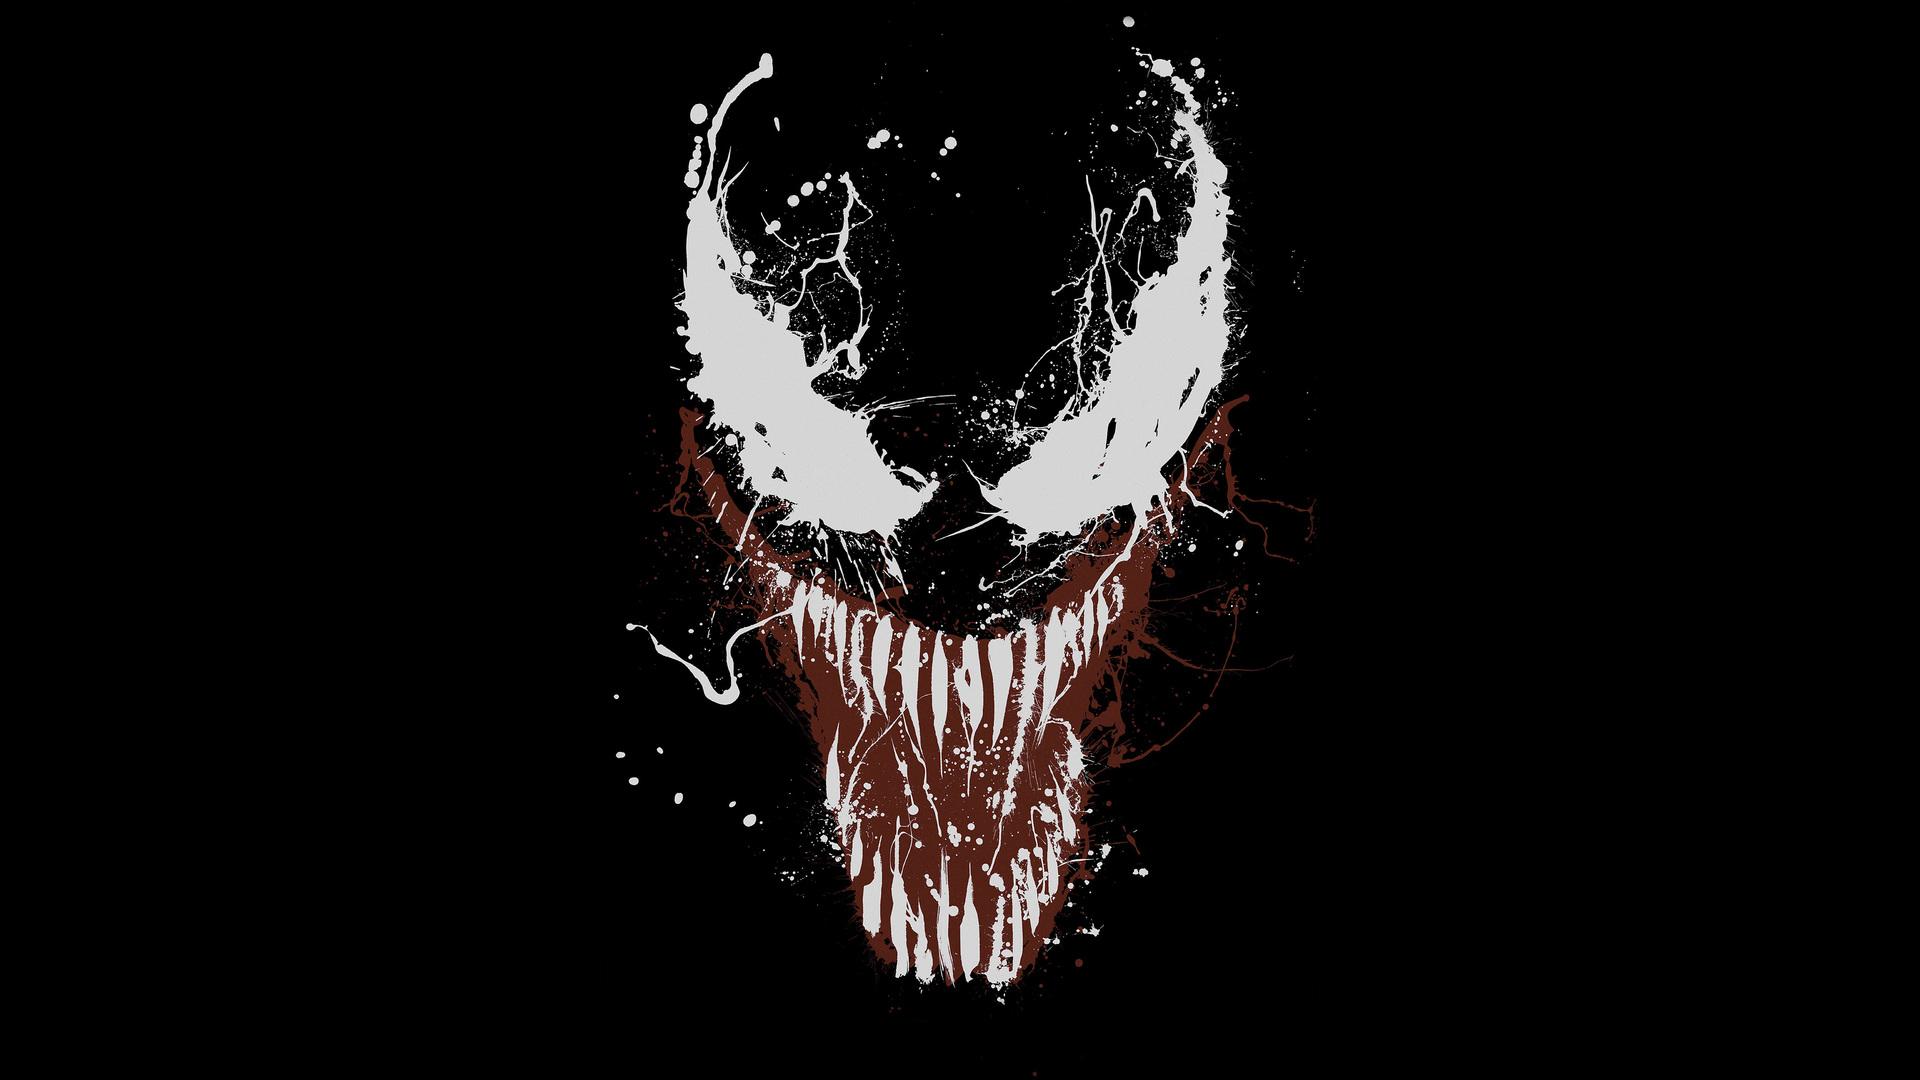 1920x1080 Venom Movie Poster 2018 Laptop Full Hd 1080p Hd 4k